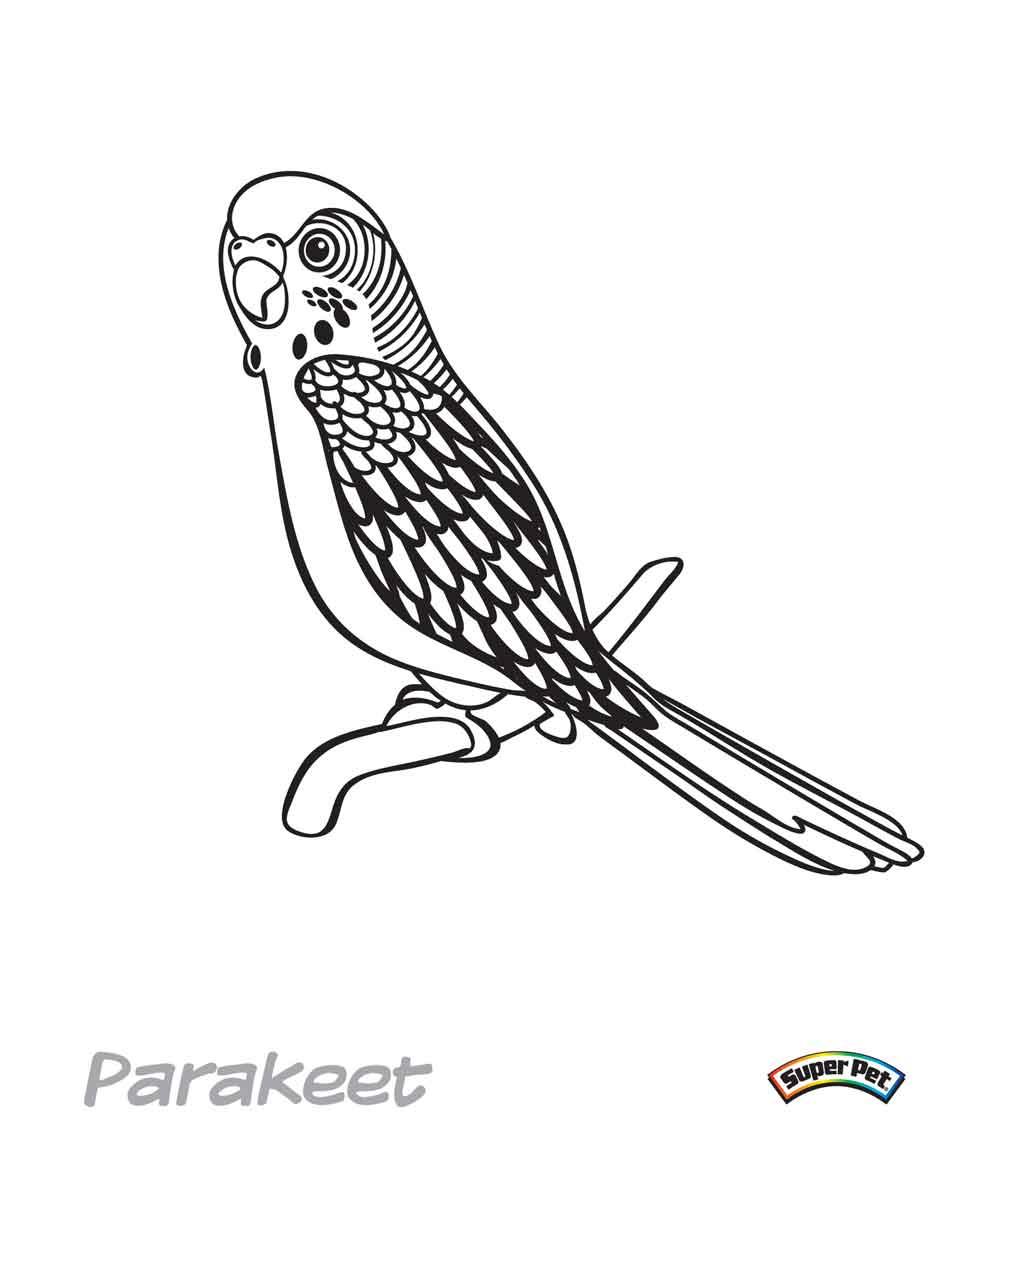 Parakeet coloring #5, Download drawings